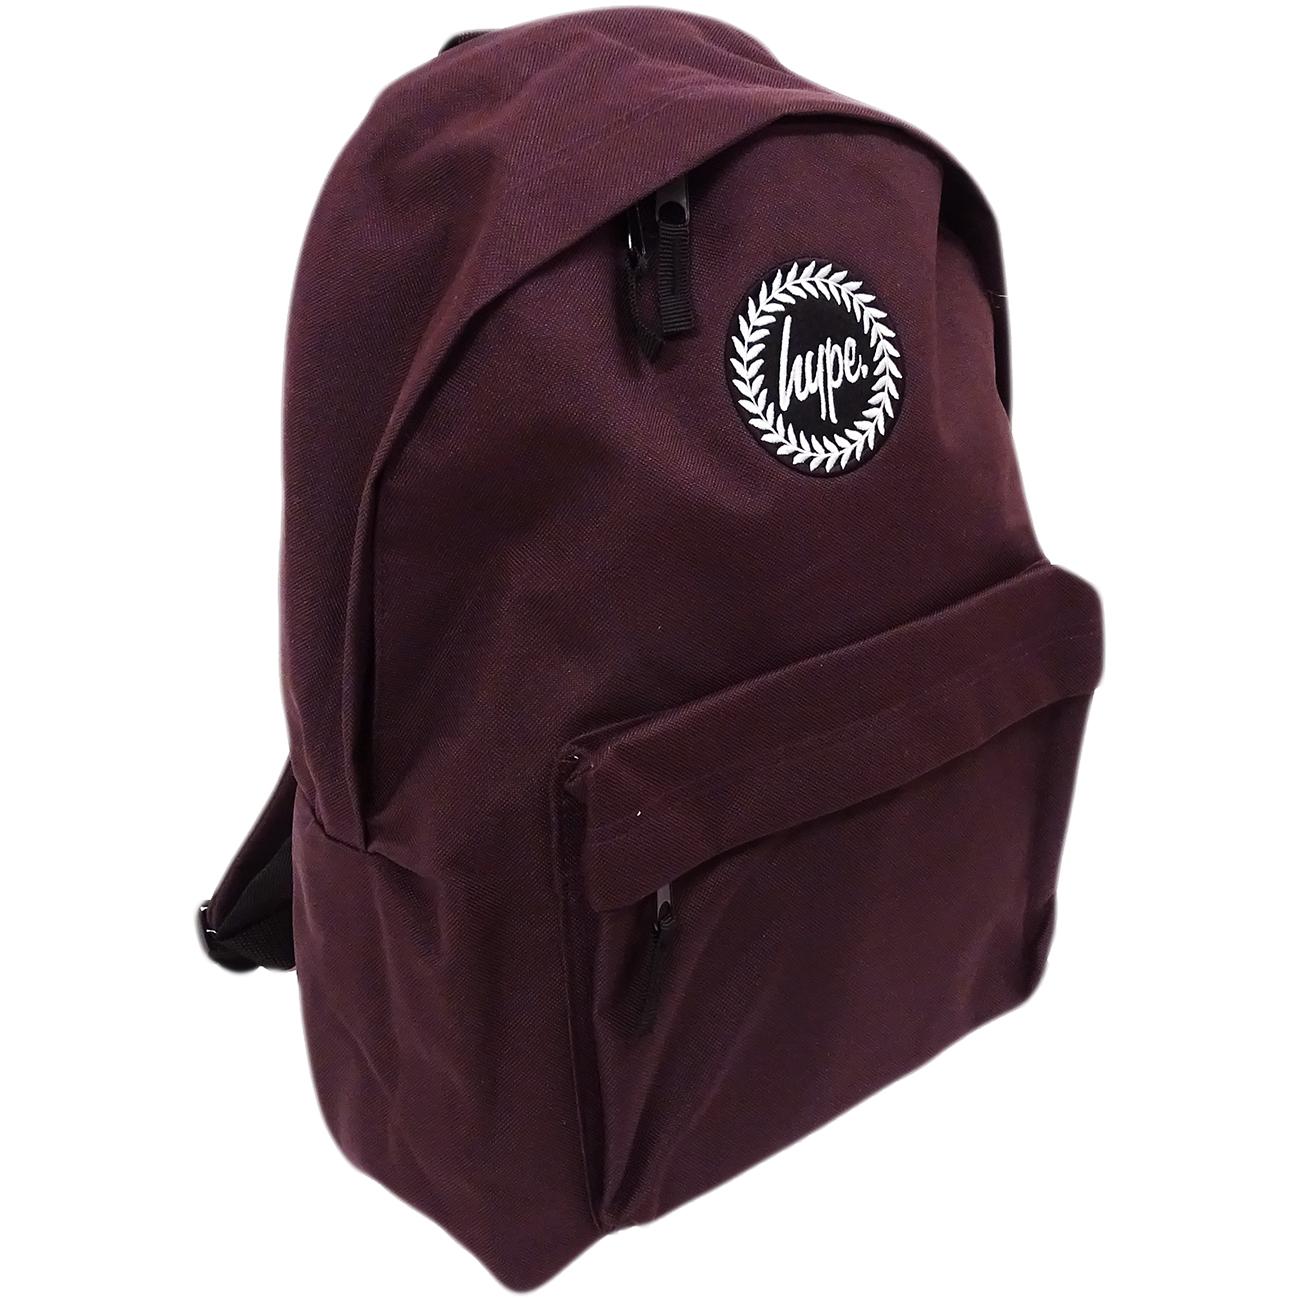 Just Hype Backpack Plain Oxblood Bag